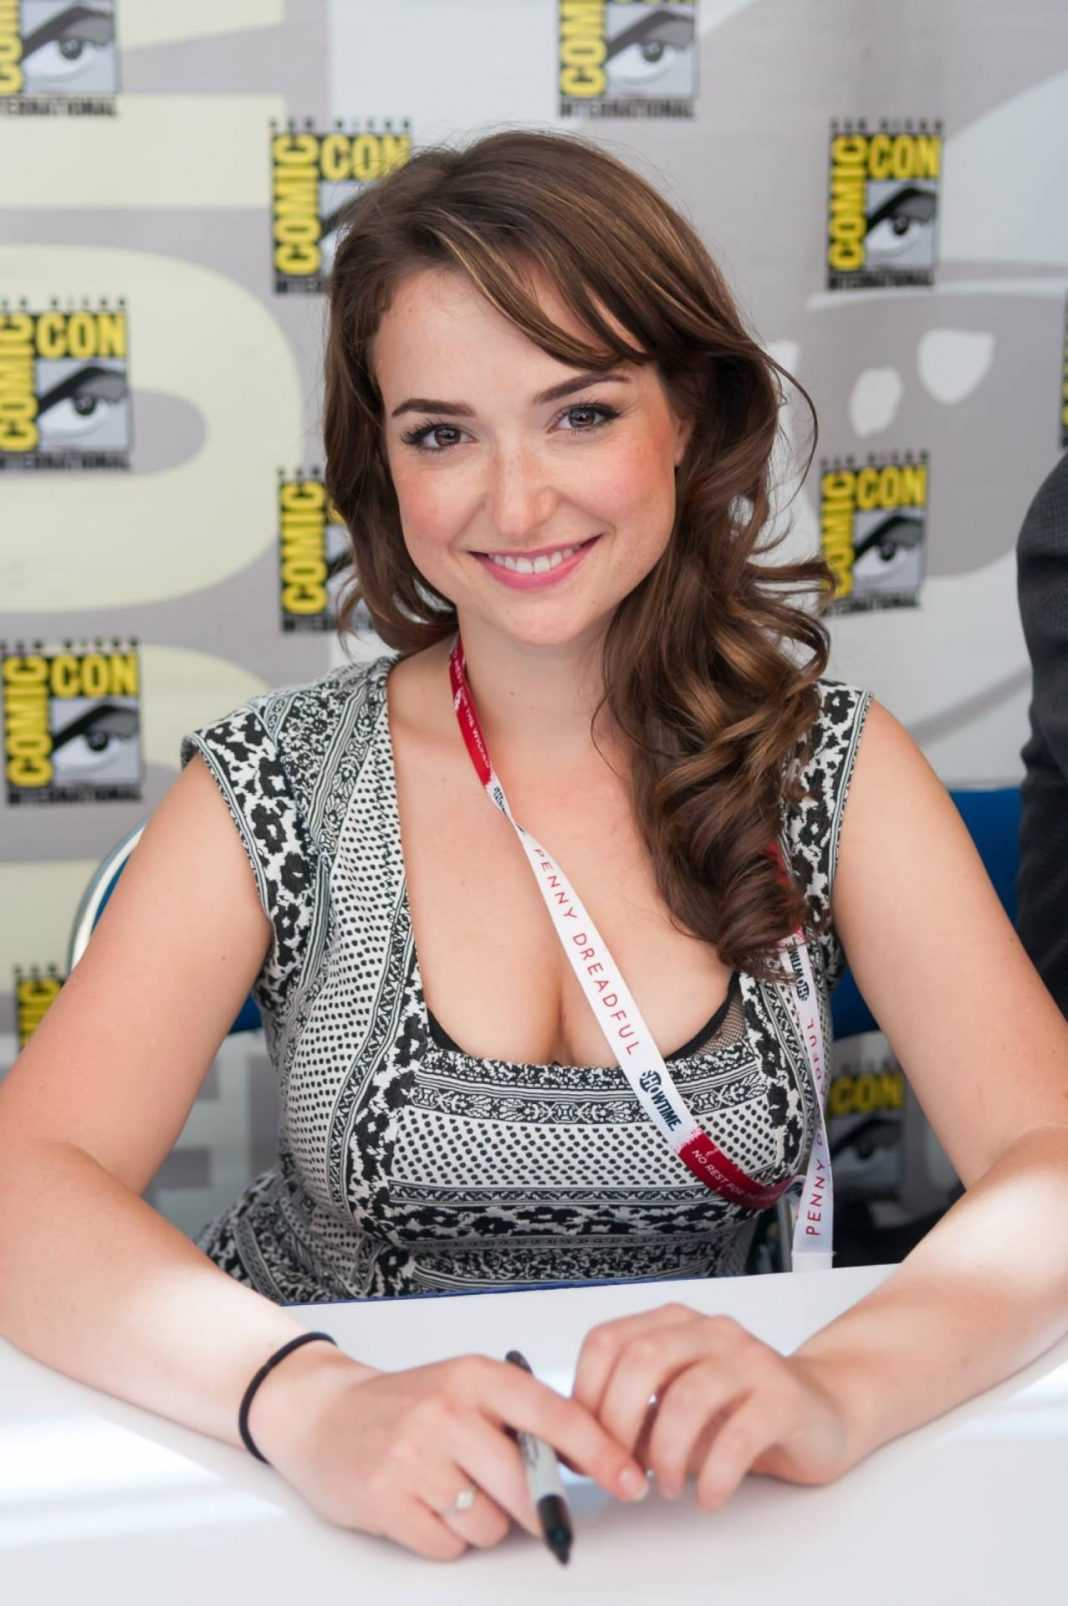 Milana Vayntrub sexy cleavage pic